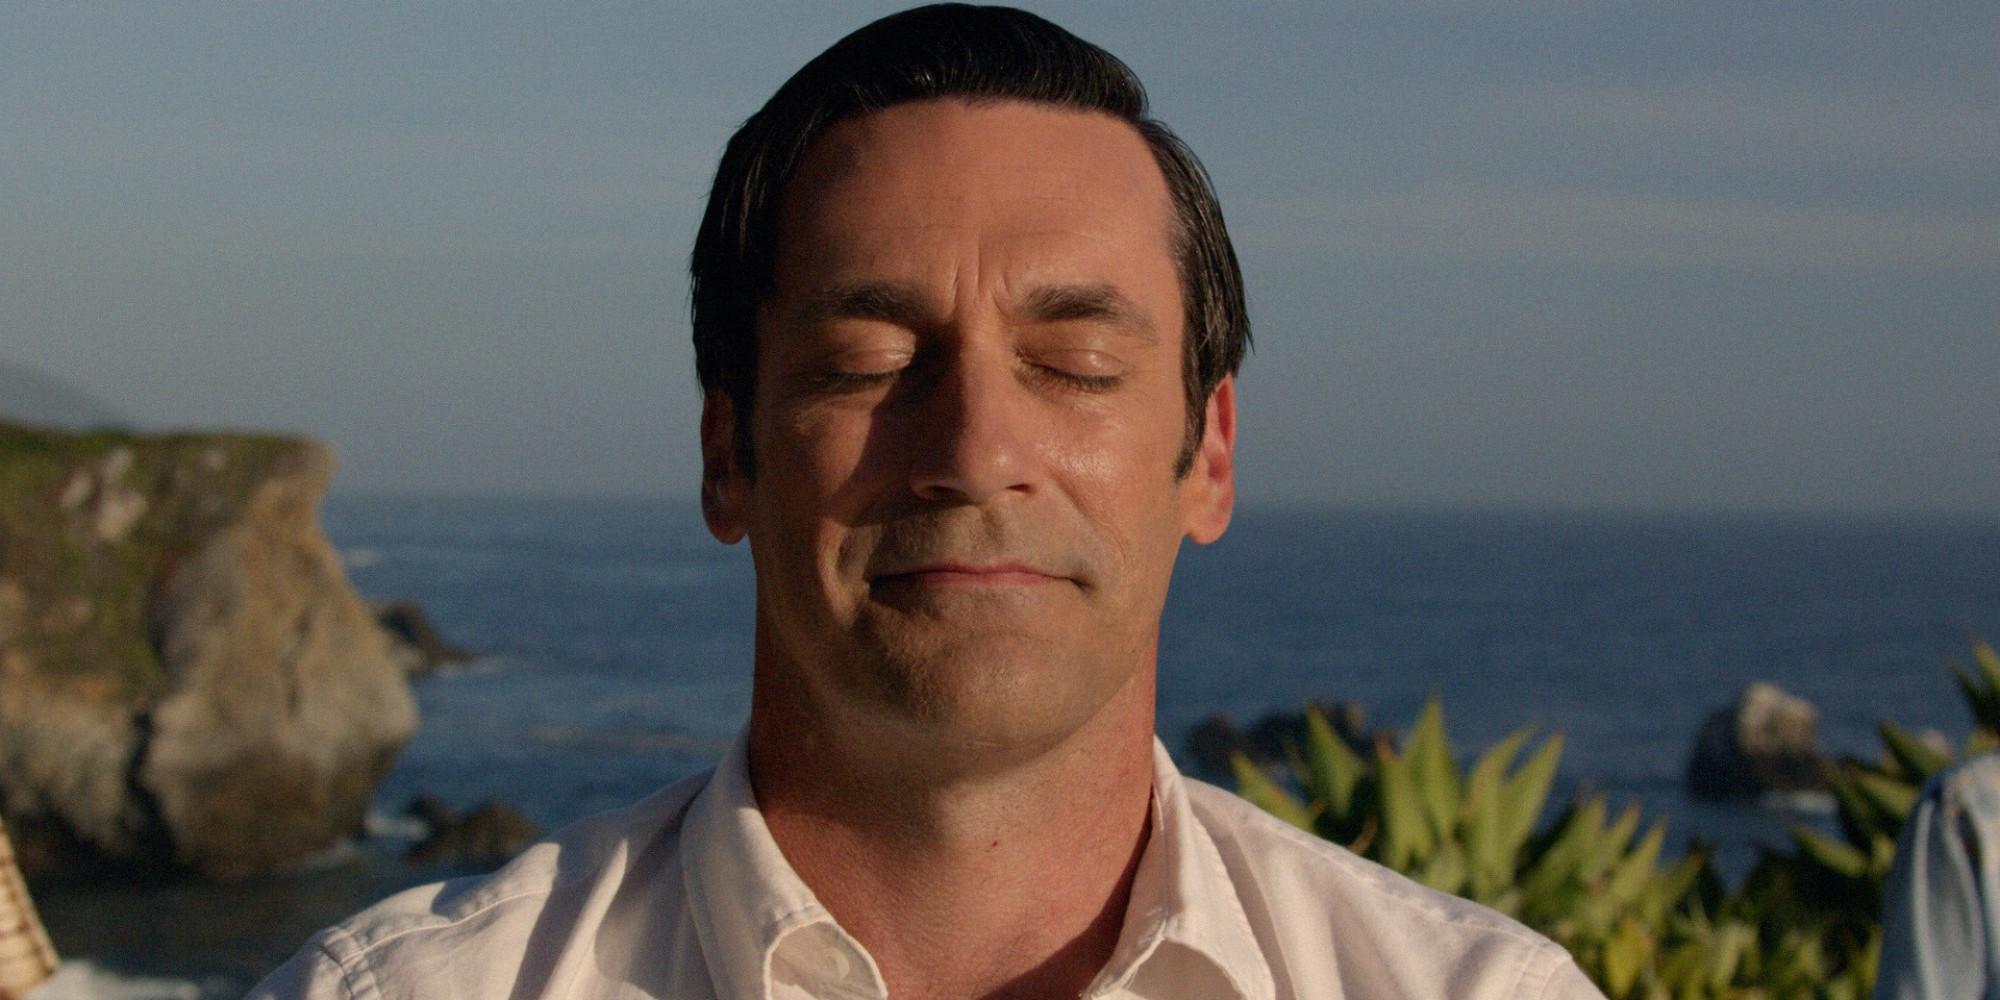 don draper, mad men, finale, final episode, coca-cola, coke, meditation